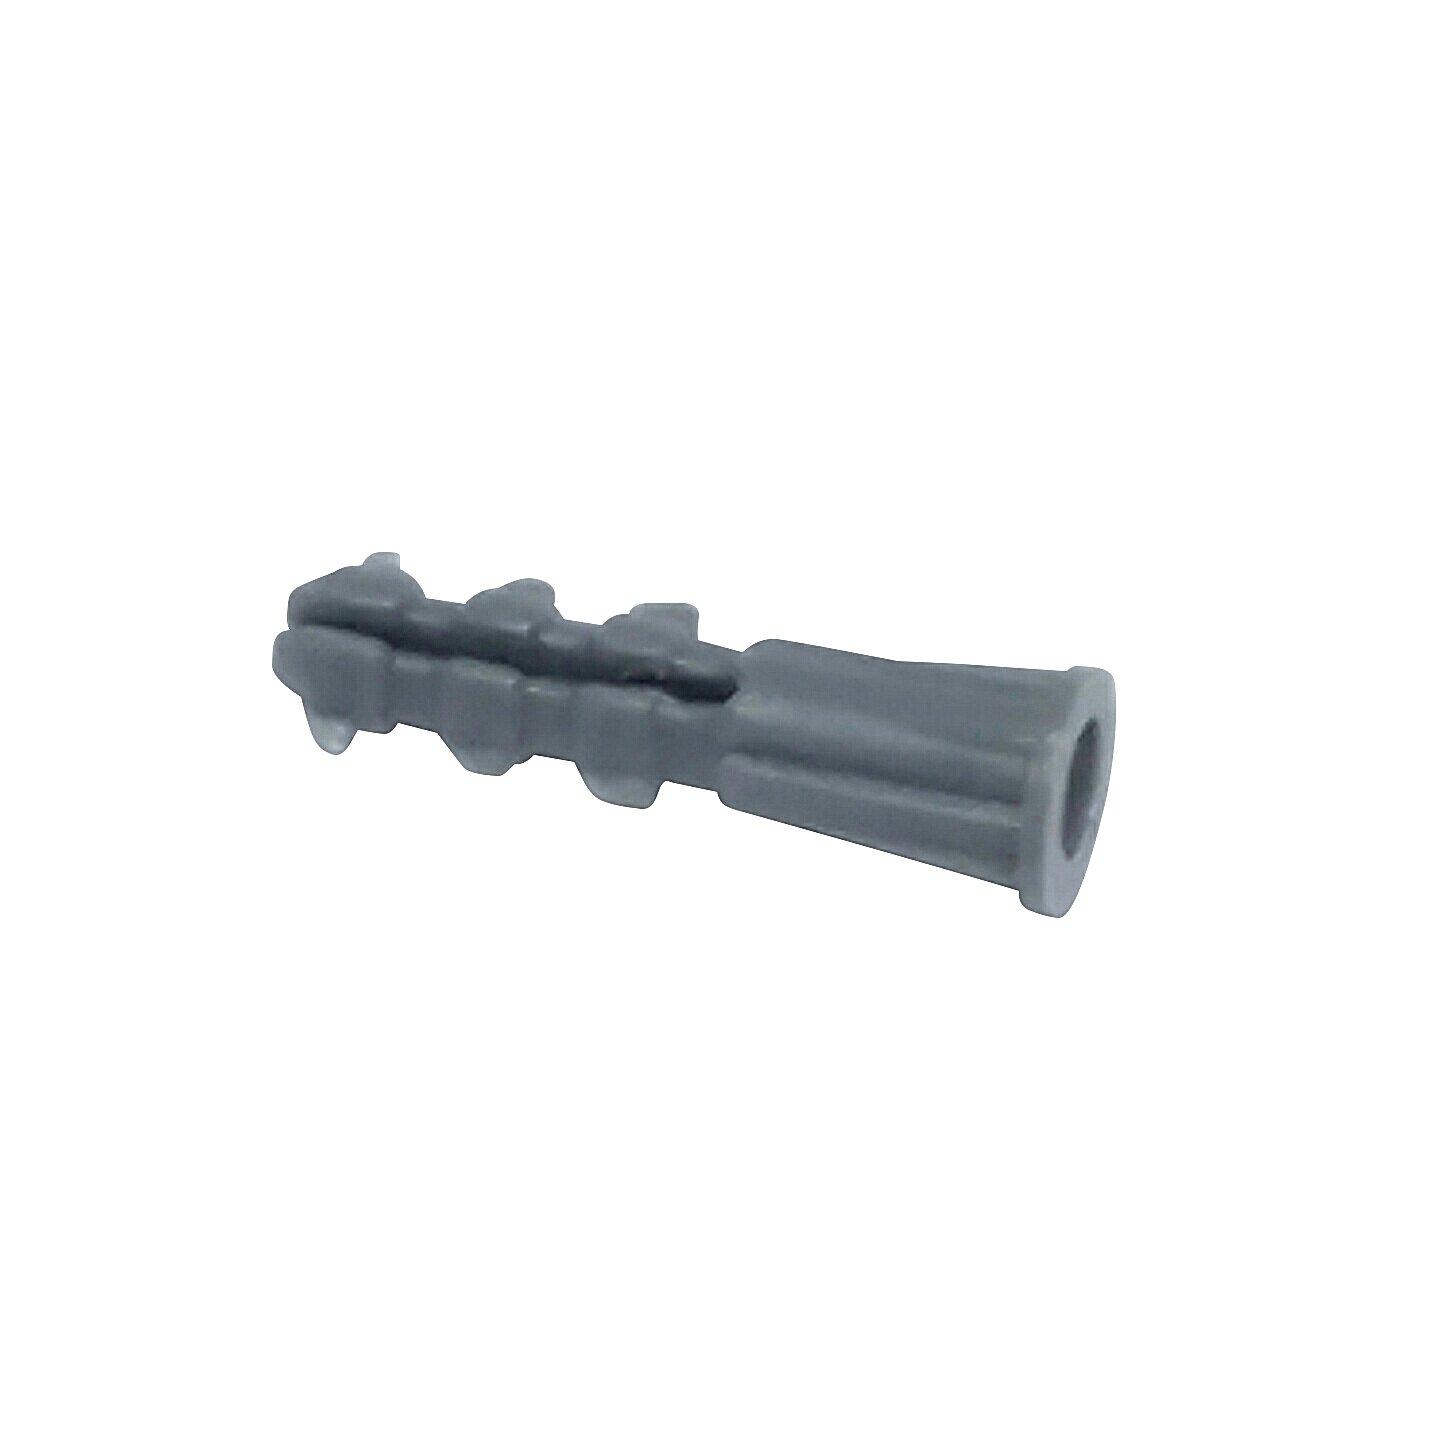 100 Pack #10-12 x 1 Premium Quality Blue Ribbed Plastic Anchors